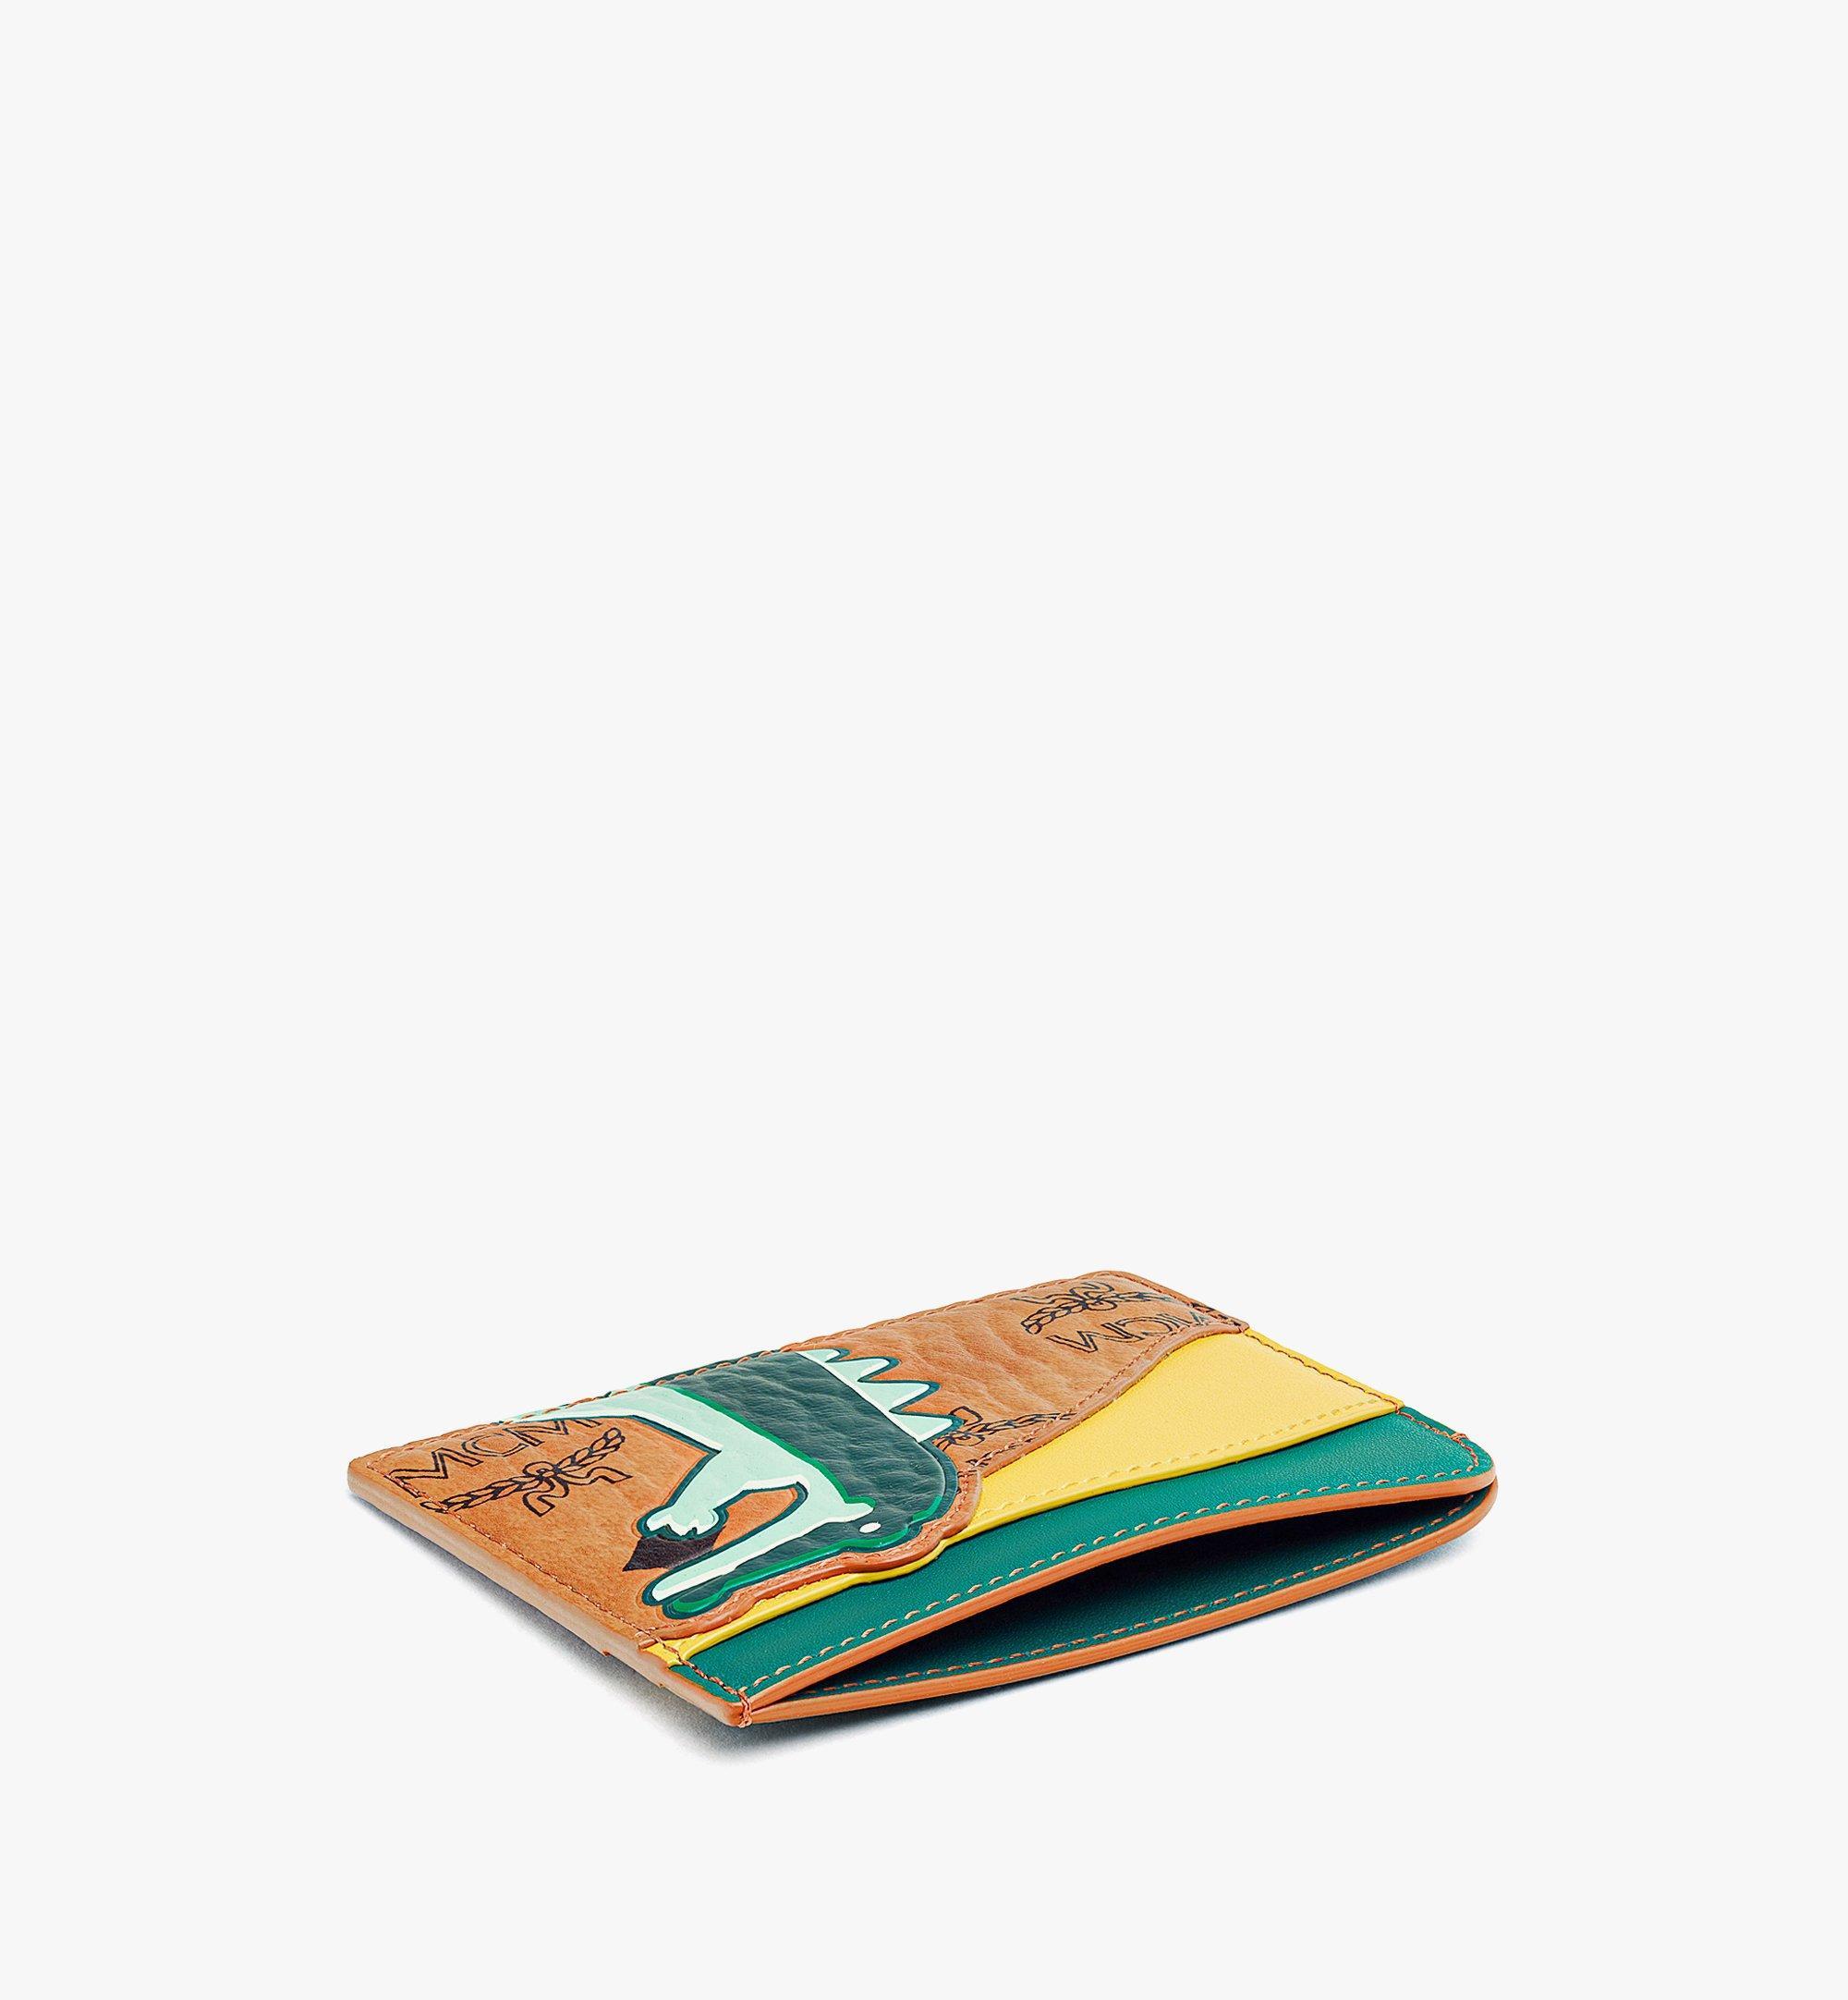 MCM MCM Zoo Crocodile Card Case in Visetos Leather Mix Cognac MXABSXL02CO001 Alternate View 1